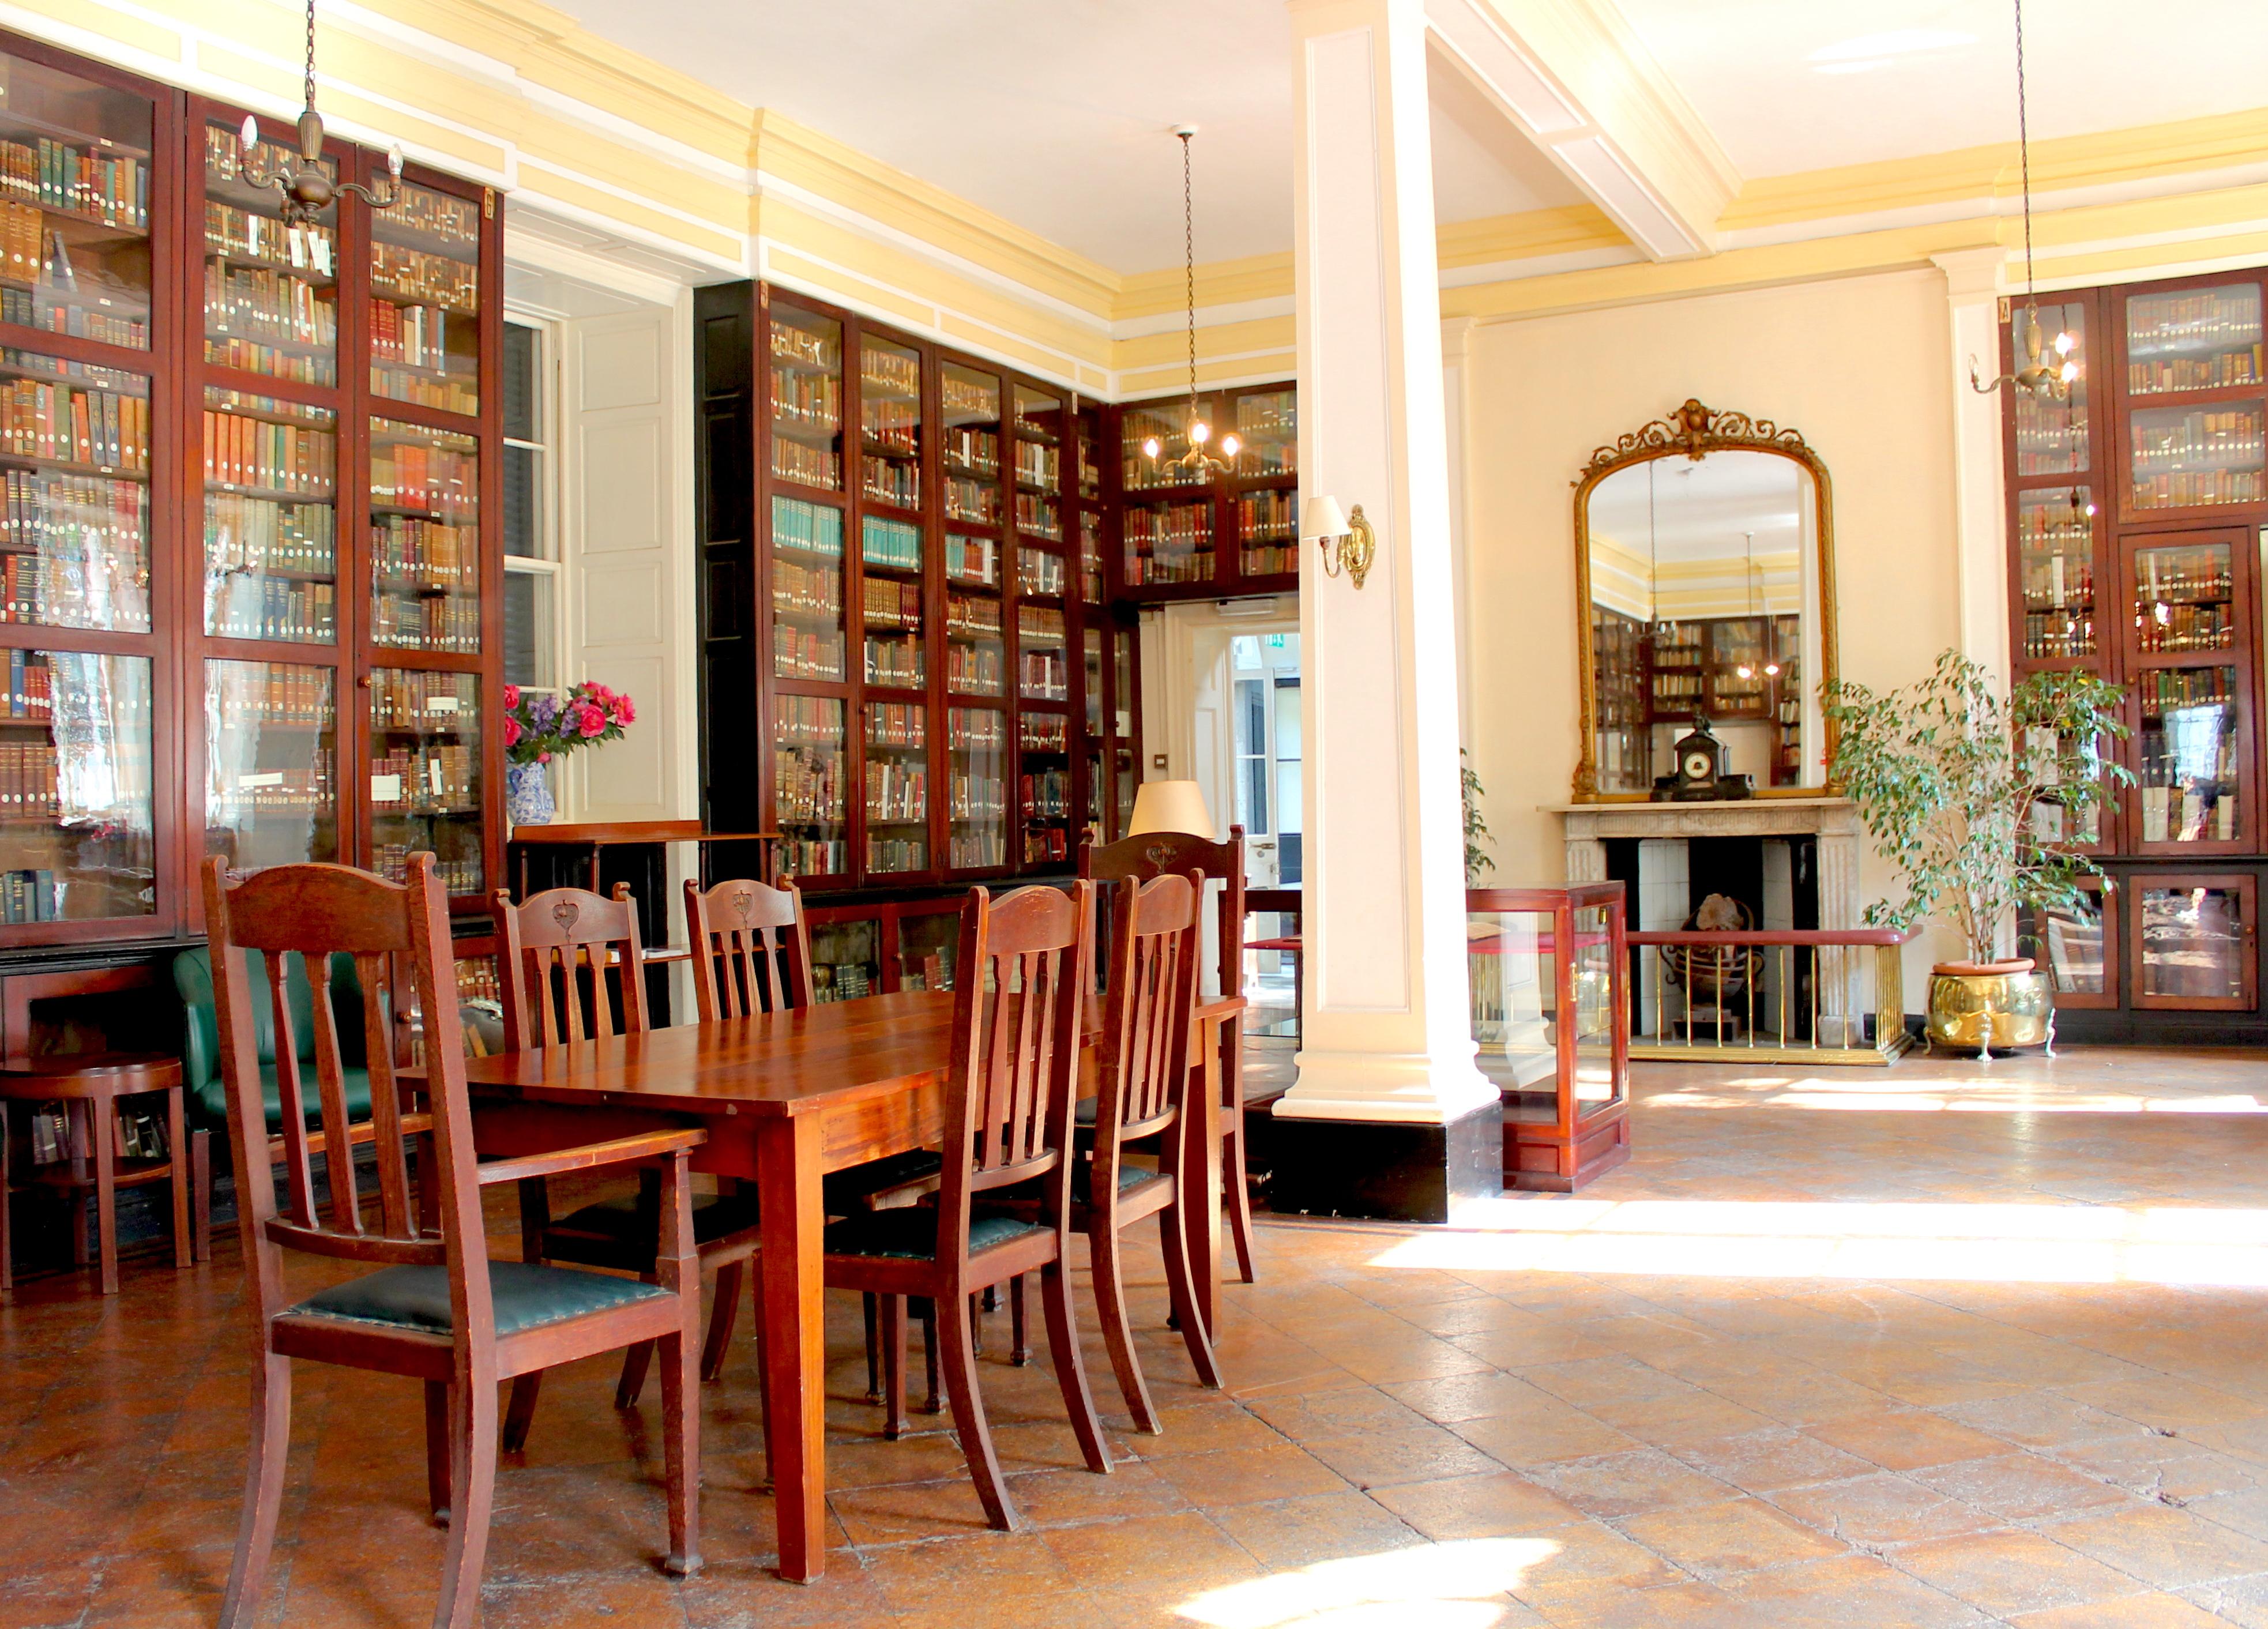 garrison-library-gibraltar-lustforthesublime